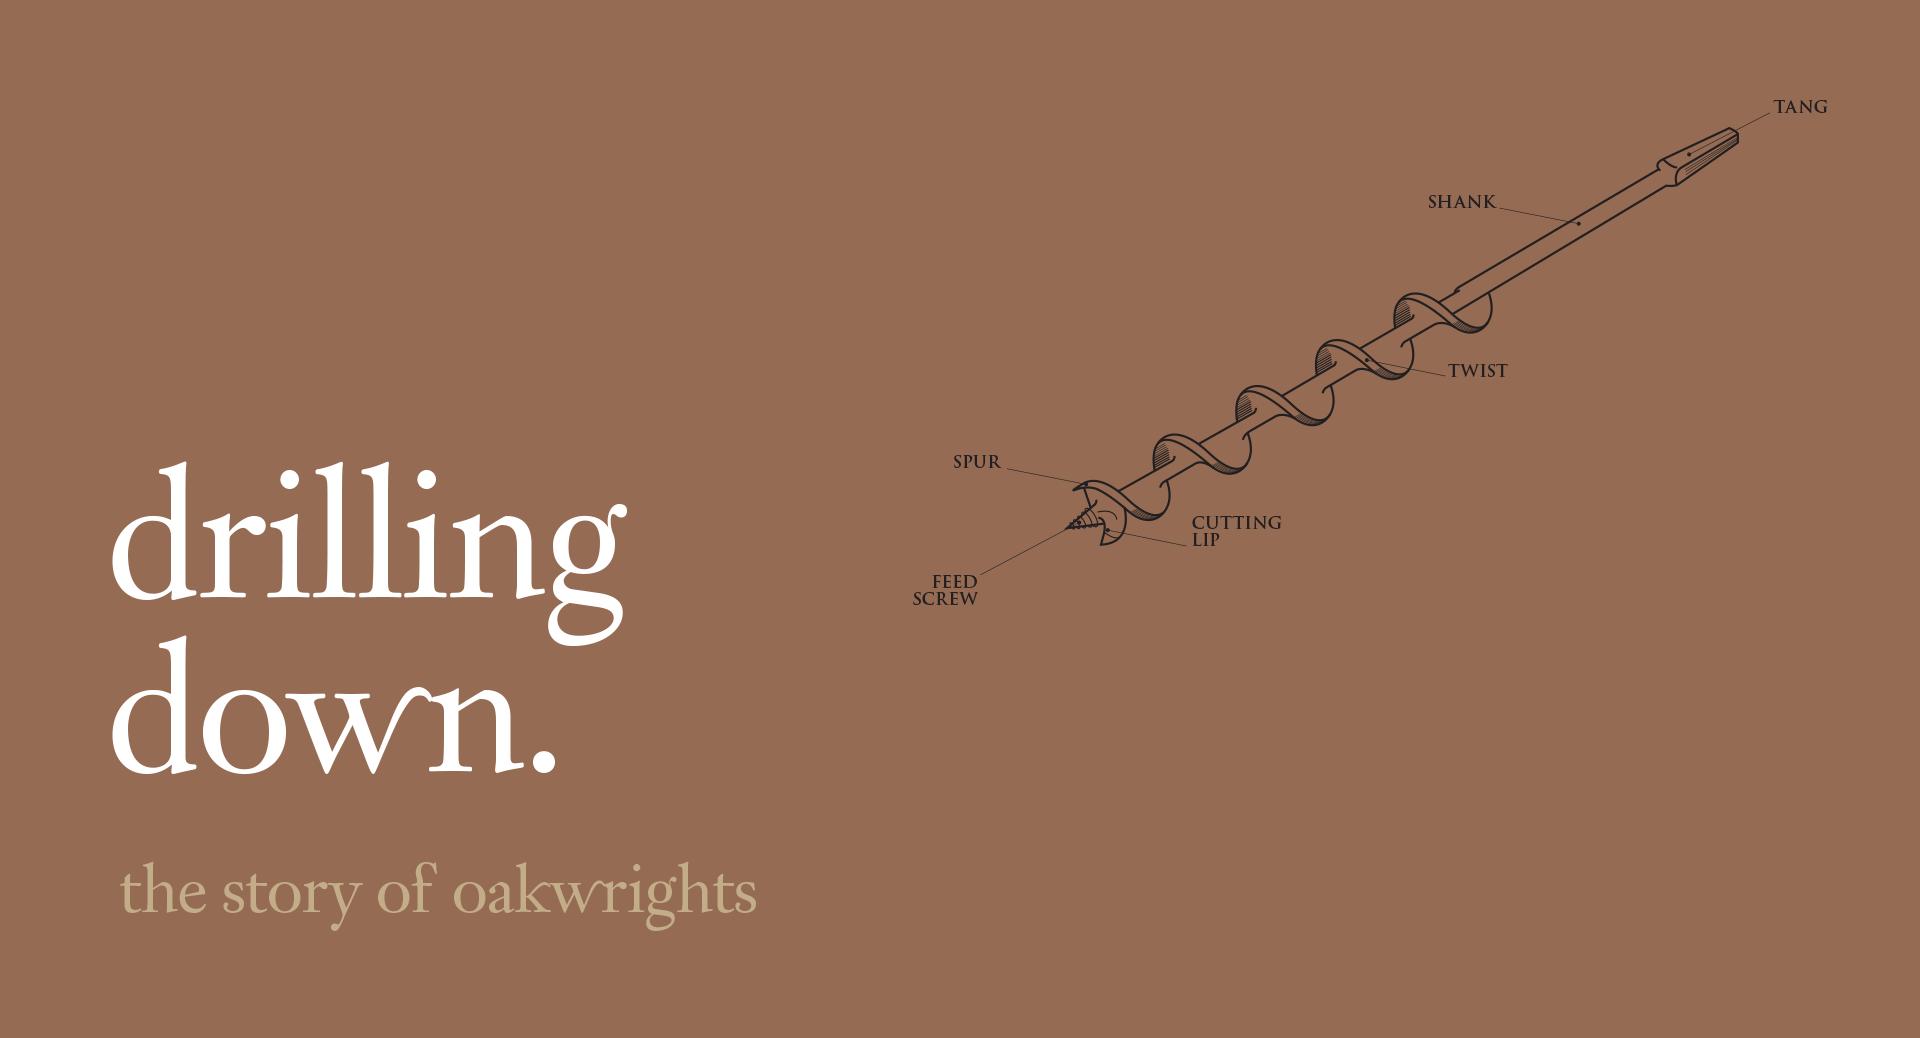 oakwrights illustration